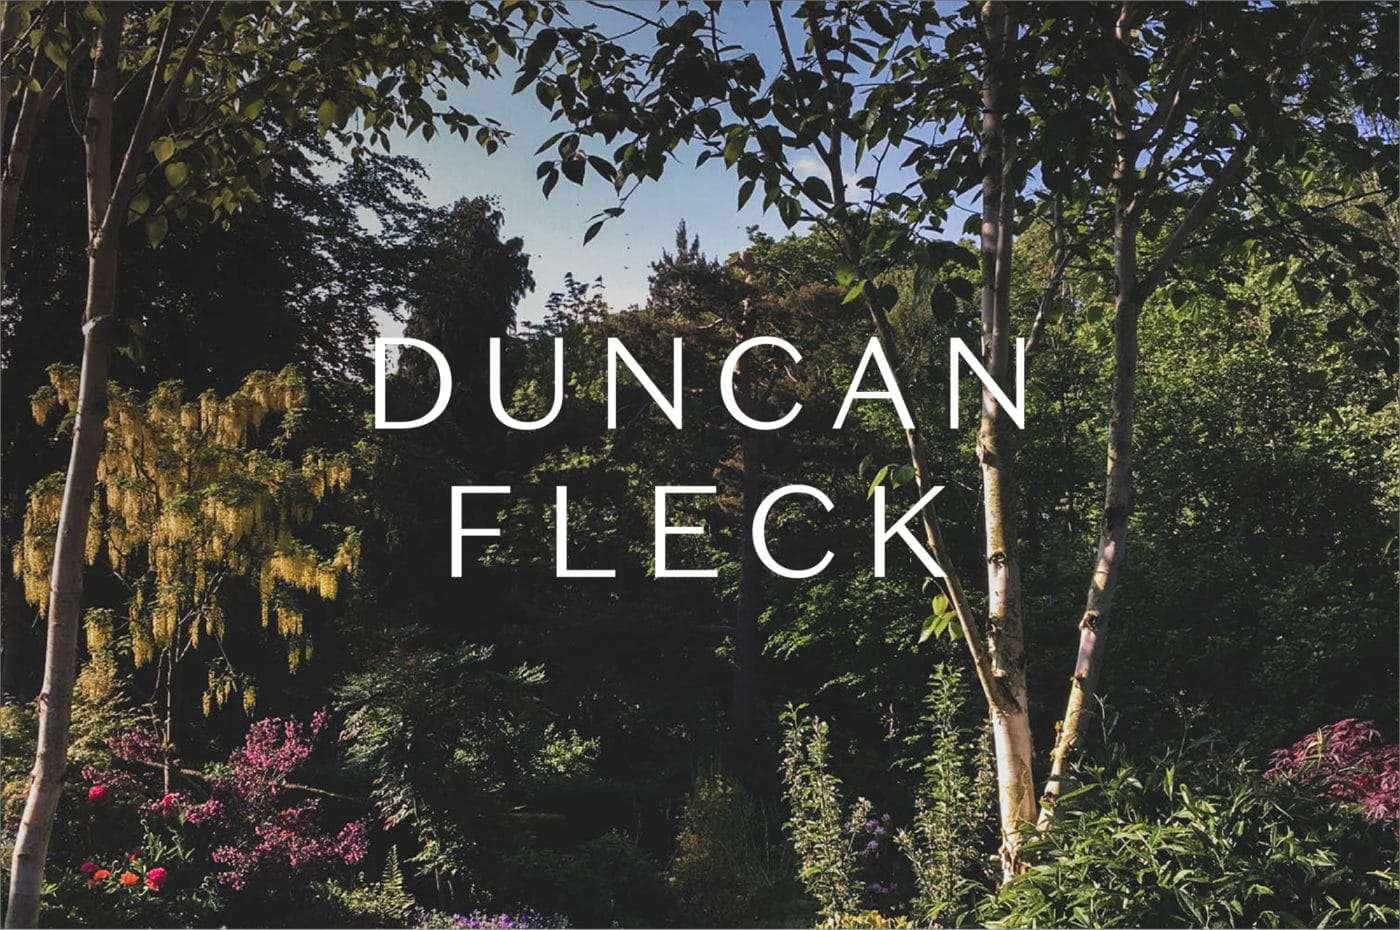 Duncan Fleck logo